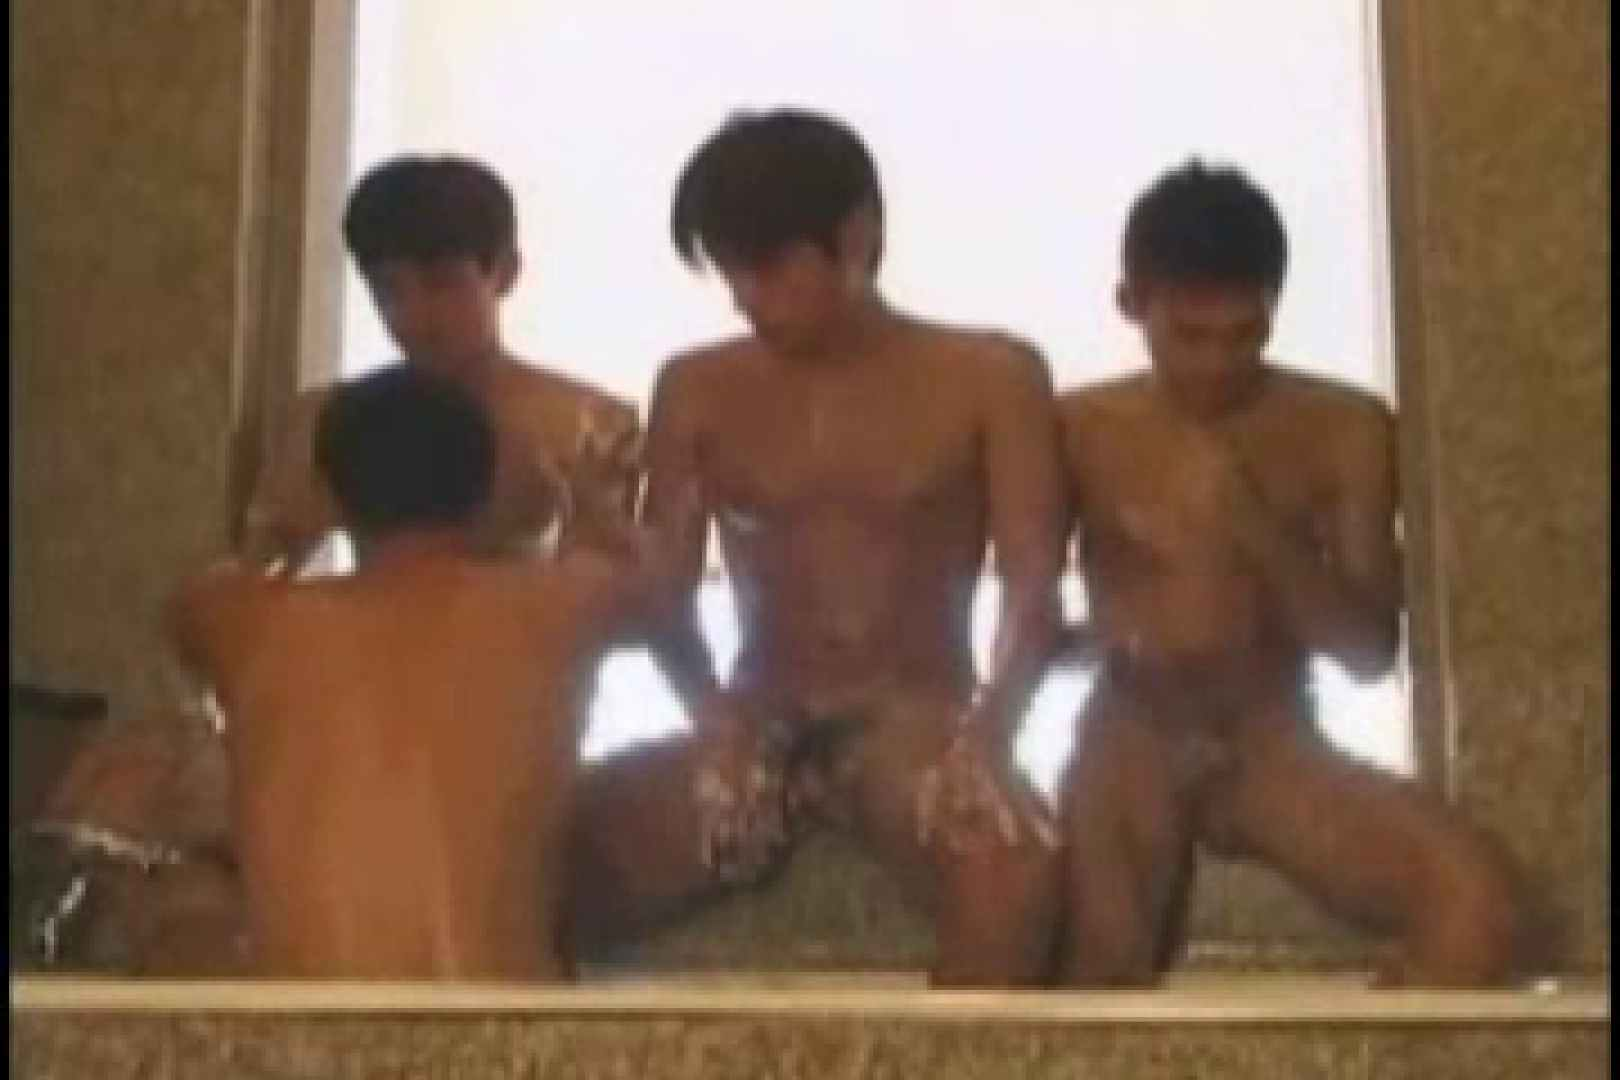 men's限定マル秘乱交サークル part.01 エロ  65pic 20